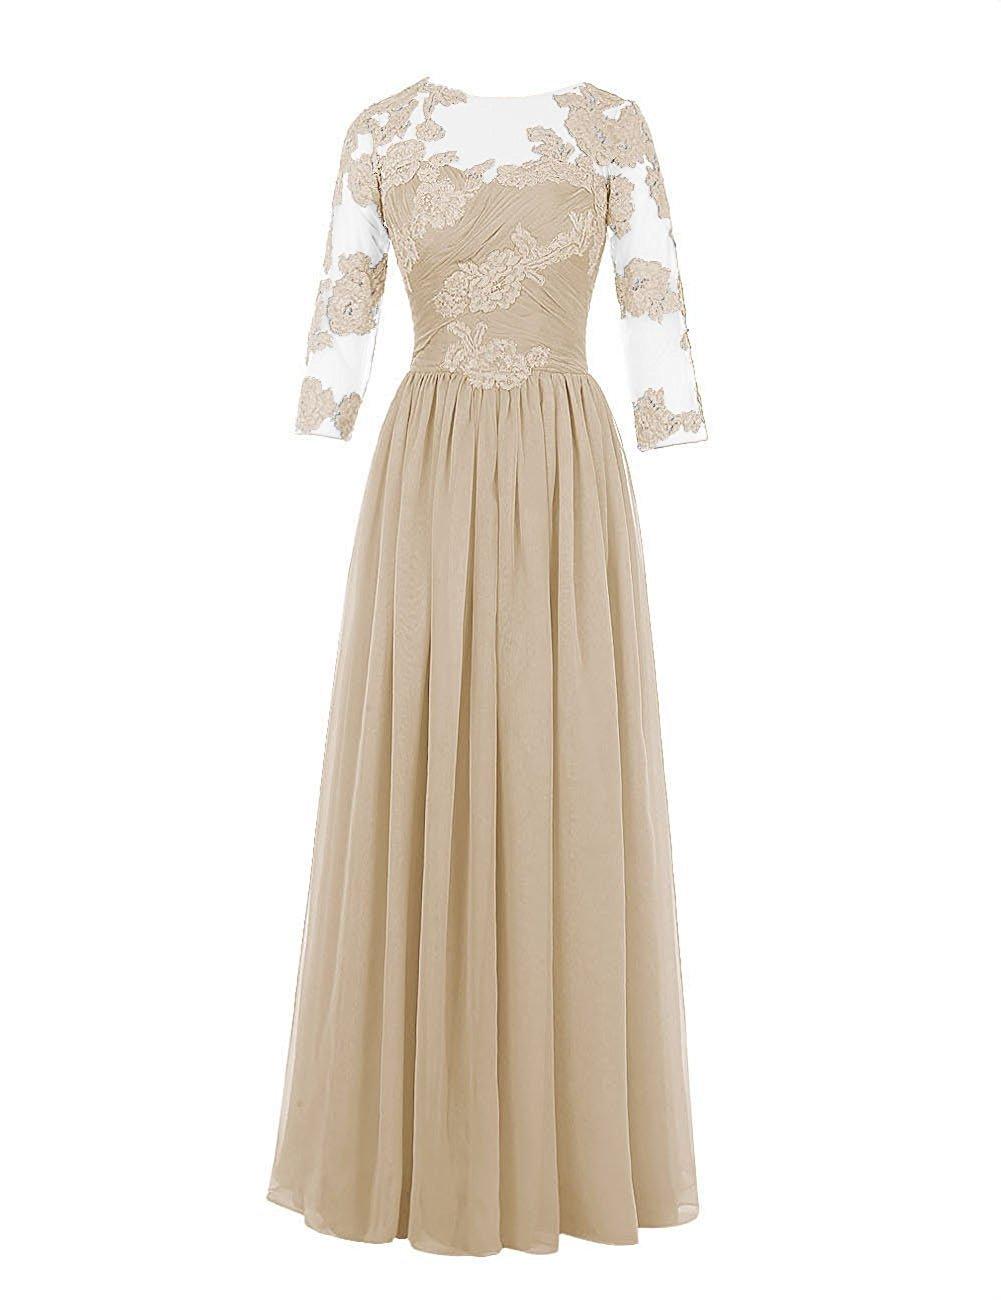 ThaliaDress Women Elegant Sheer Sleeves Evening Prom Dress T232LF Champagne US18W